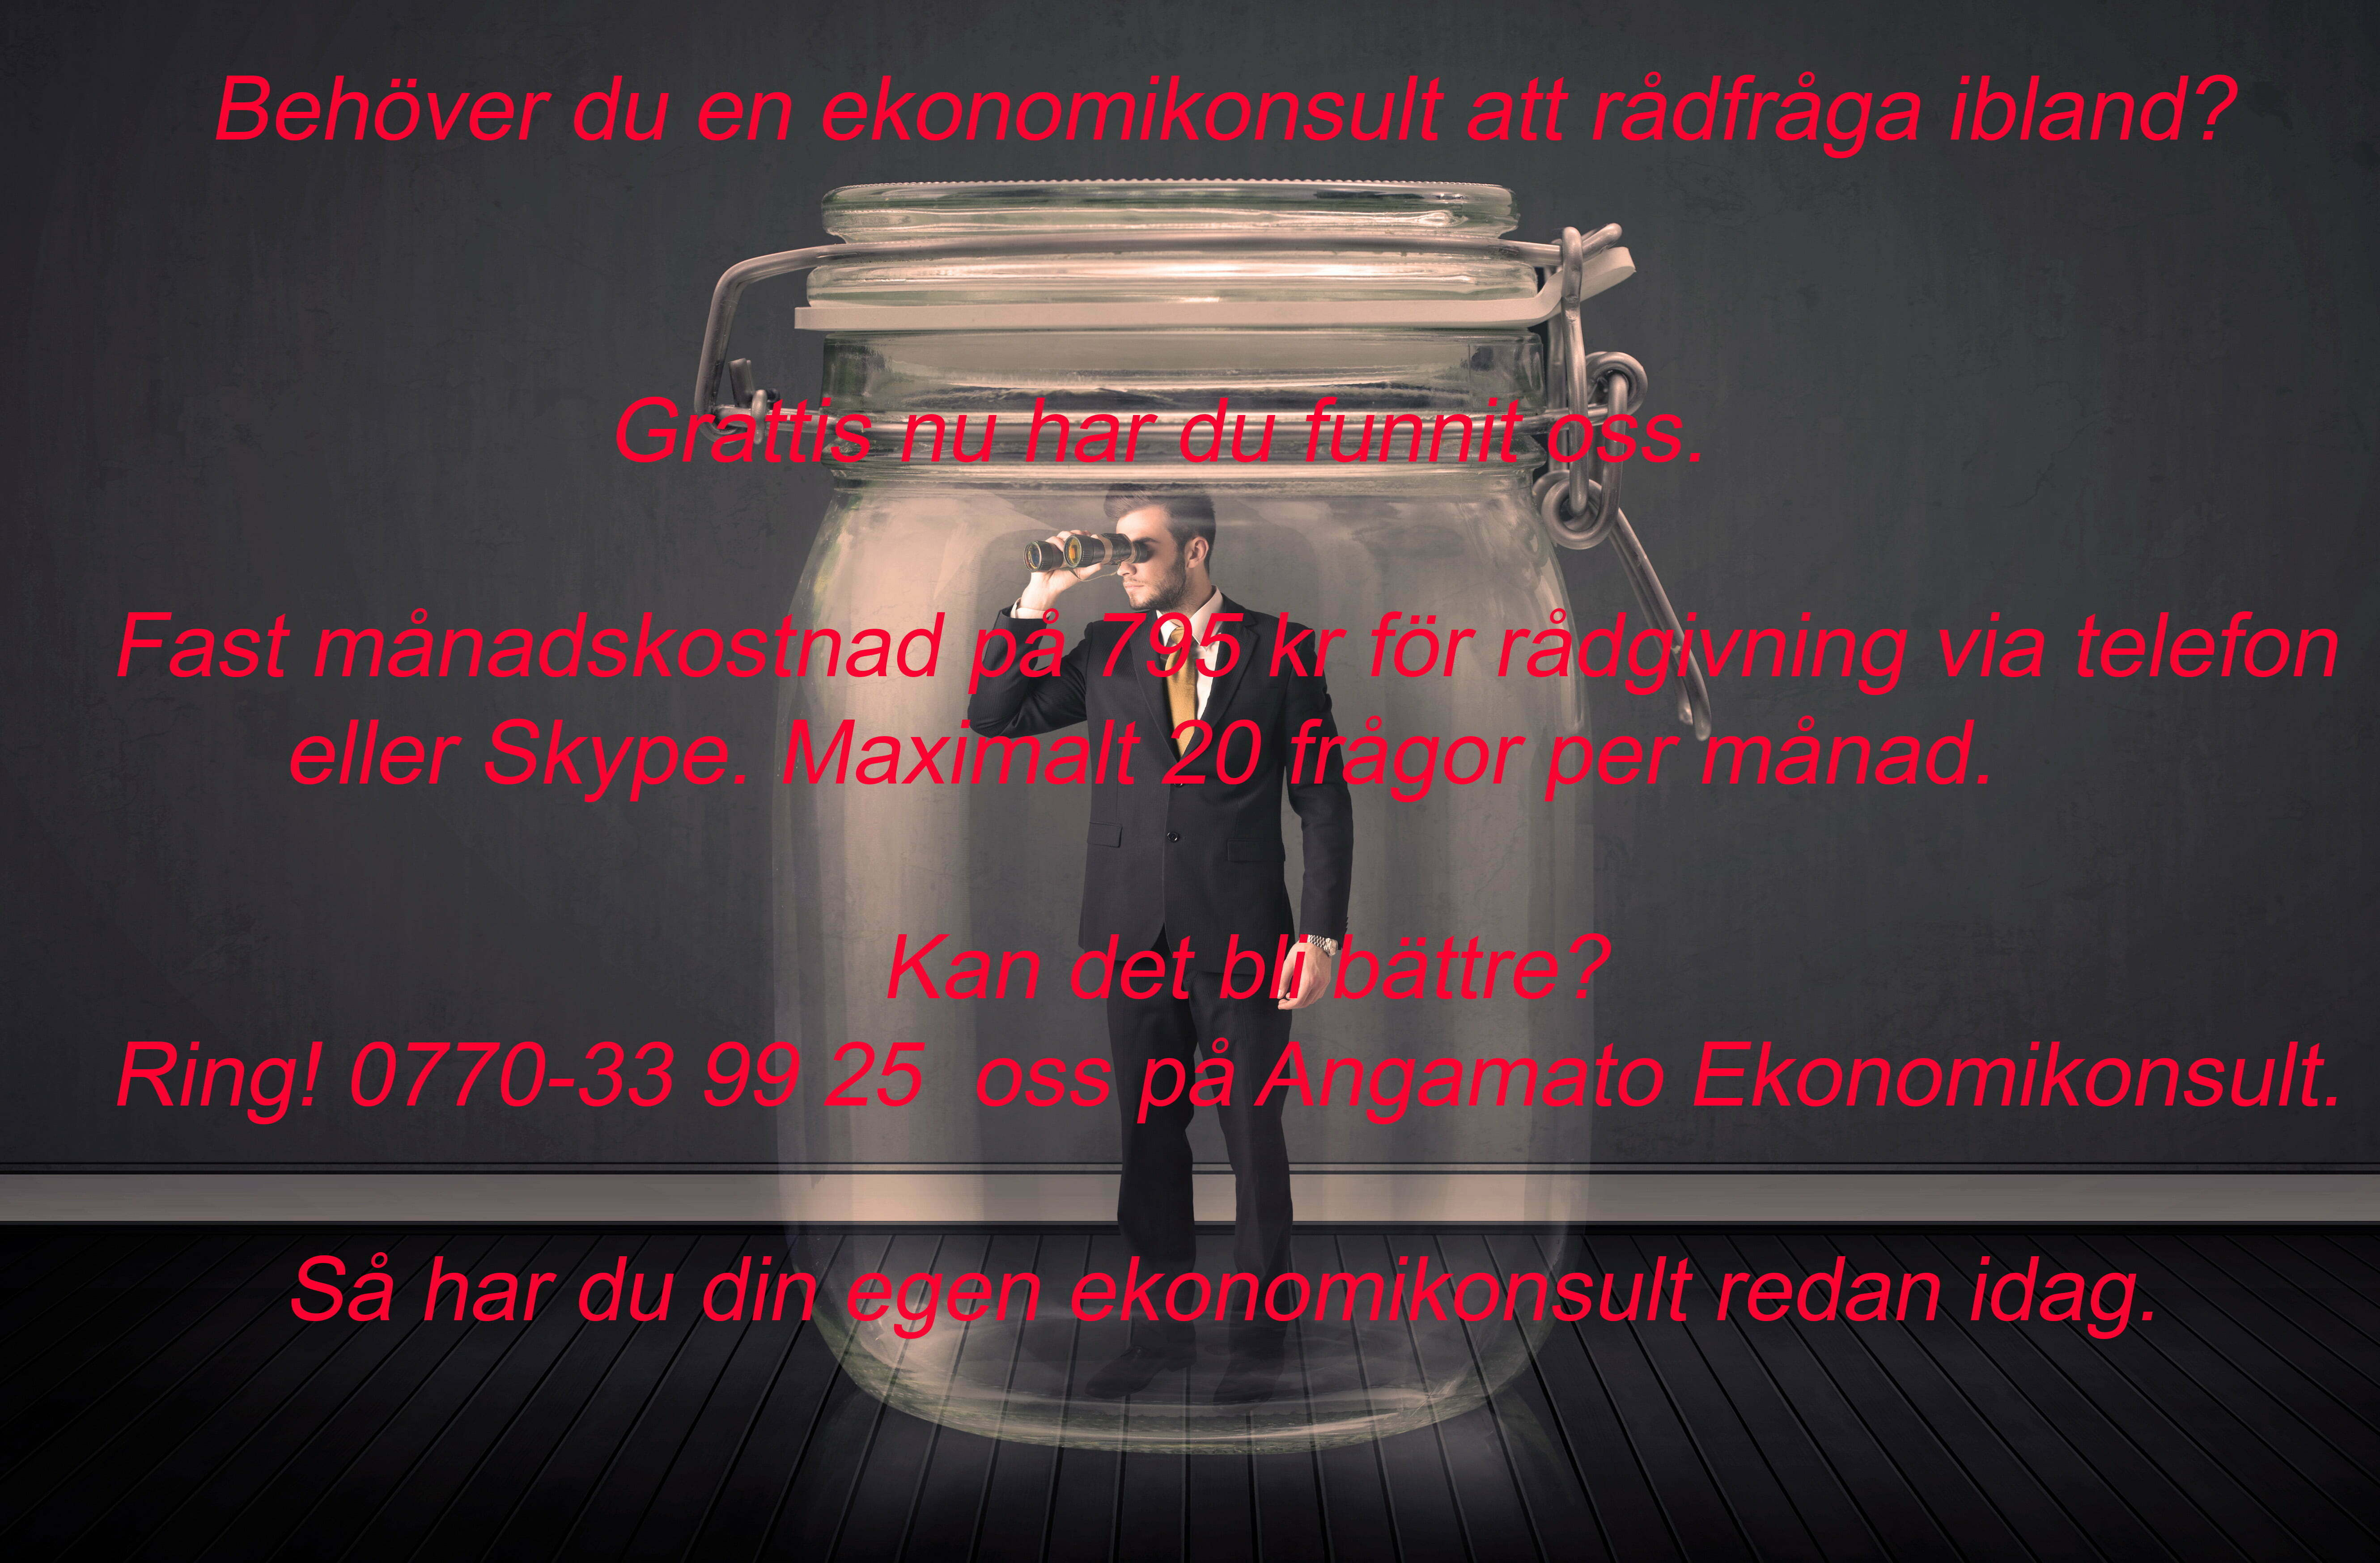 Ekonomikonsult, Ekonomikonsult på burk, Tomas Tobiasson, Angamato Ekonomikonsult AB